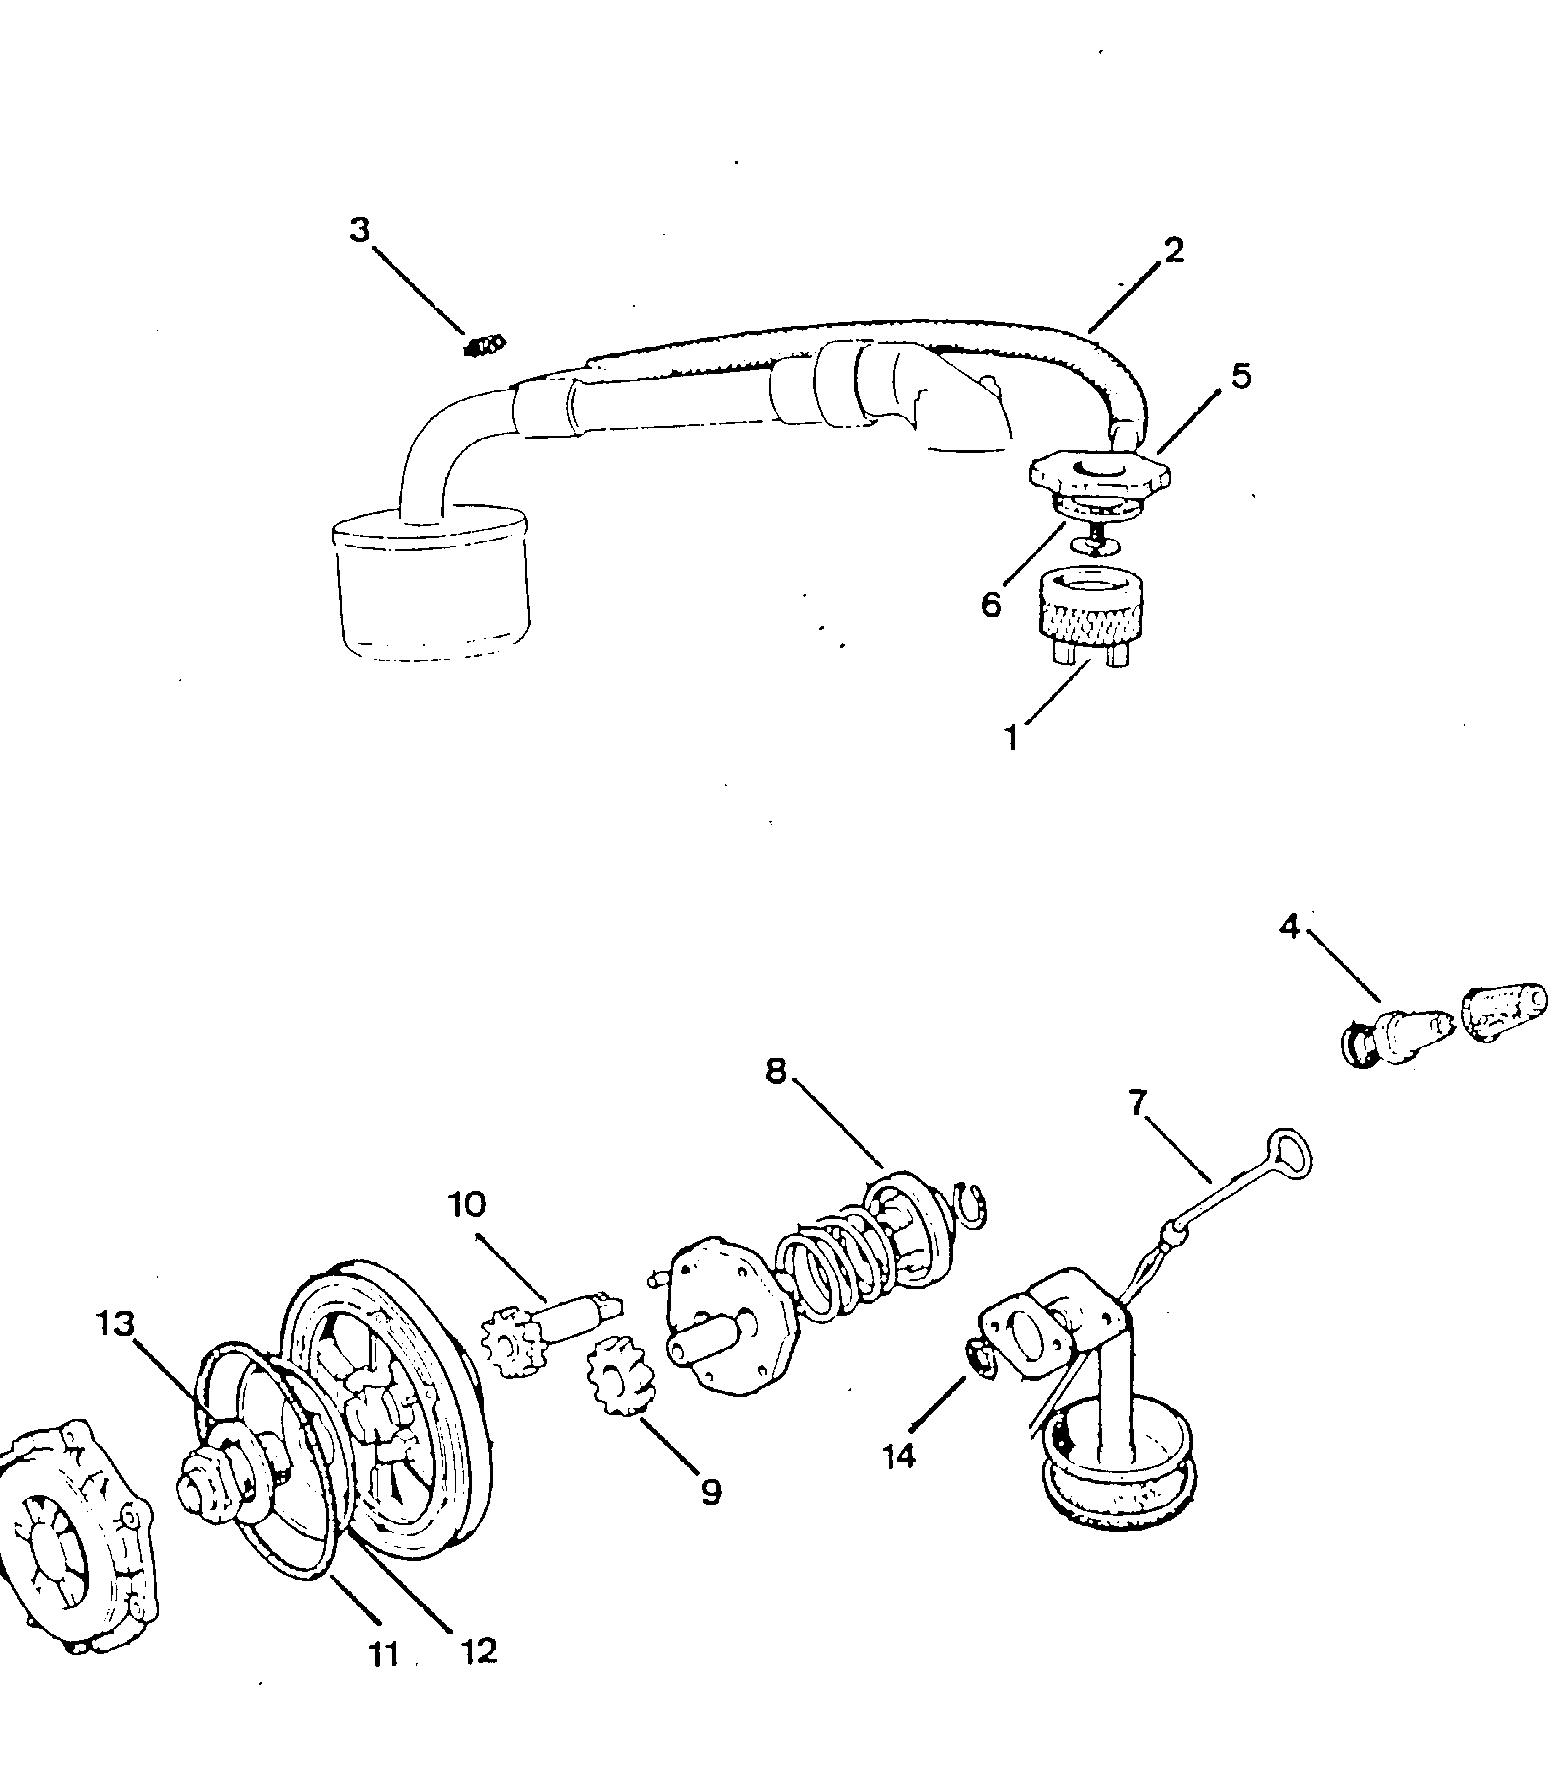 Fiat 500 Oil System